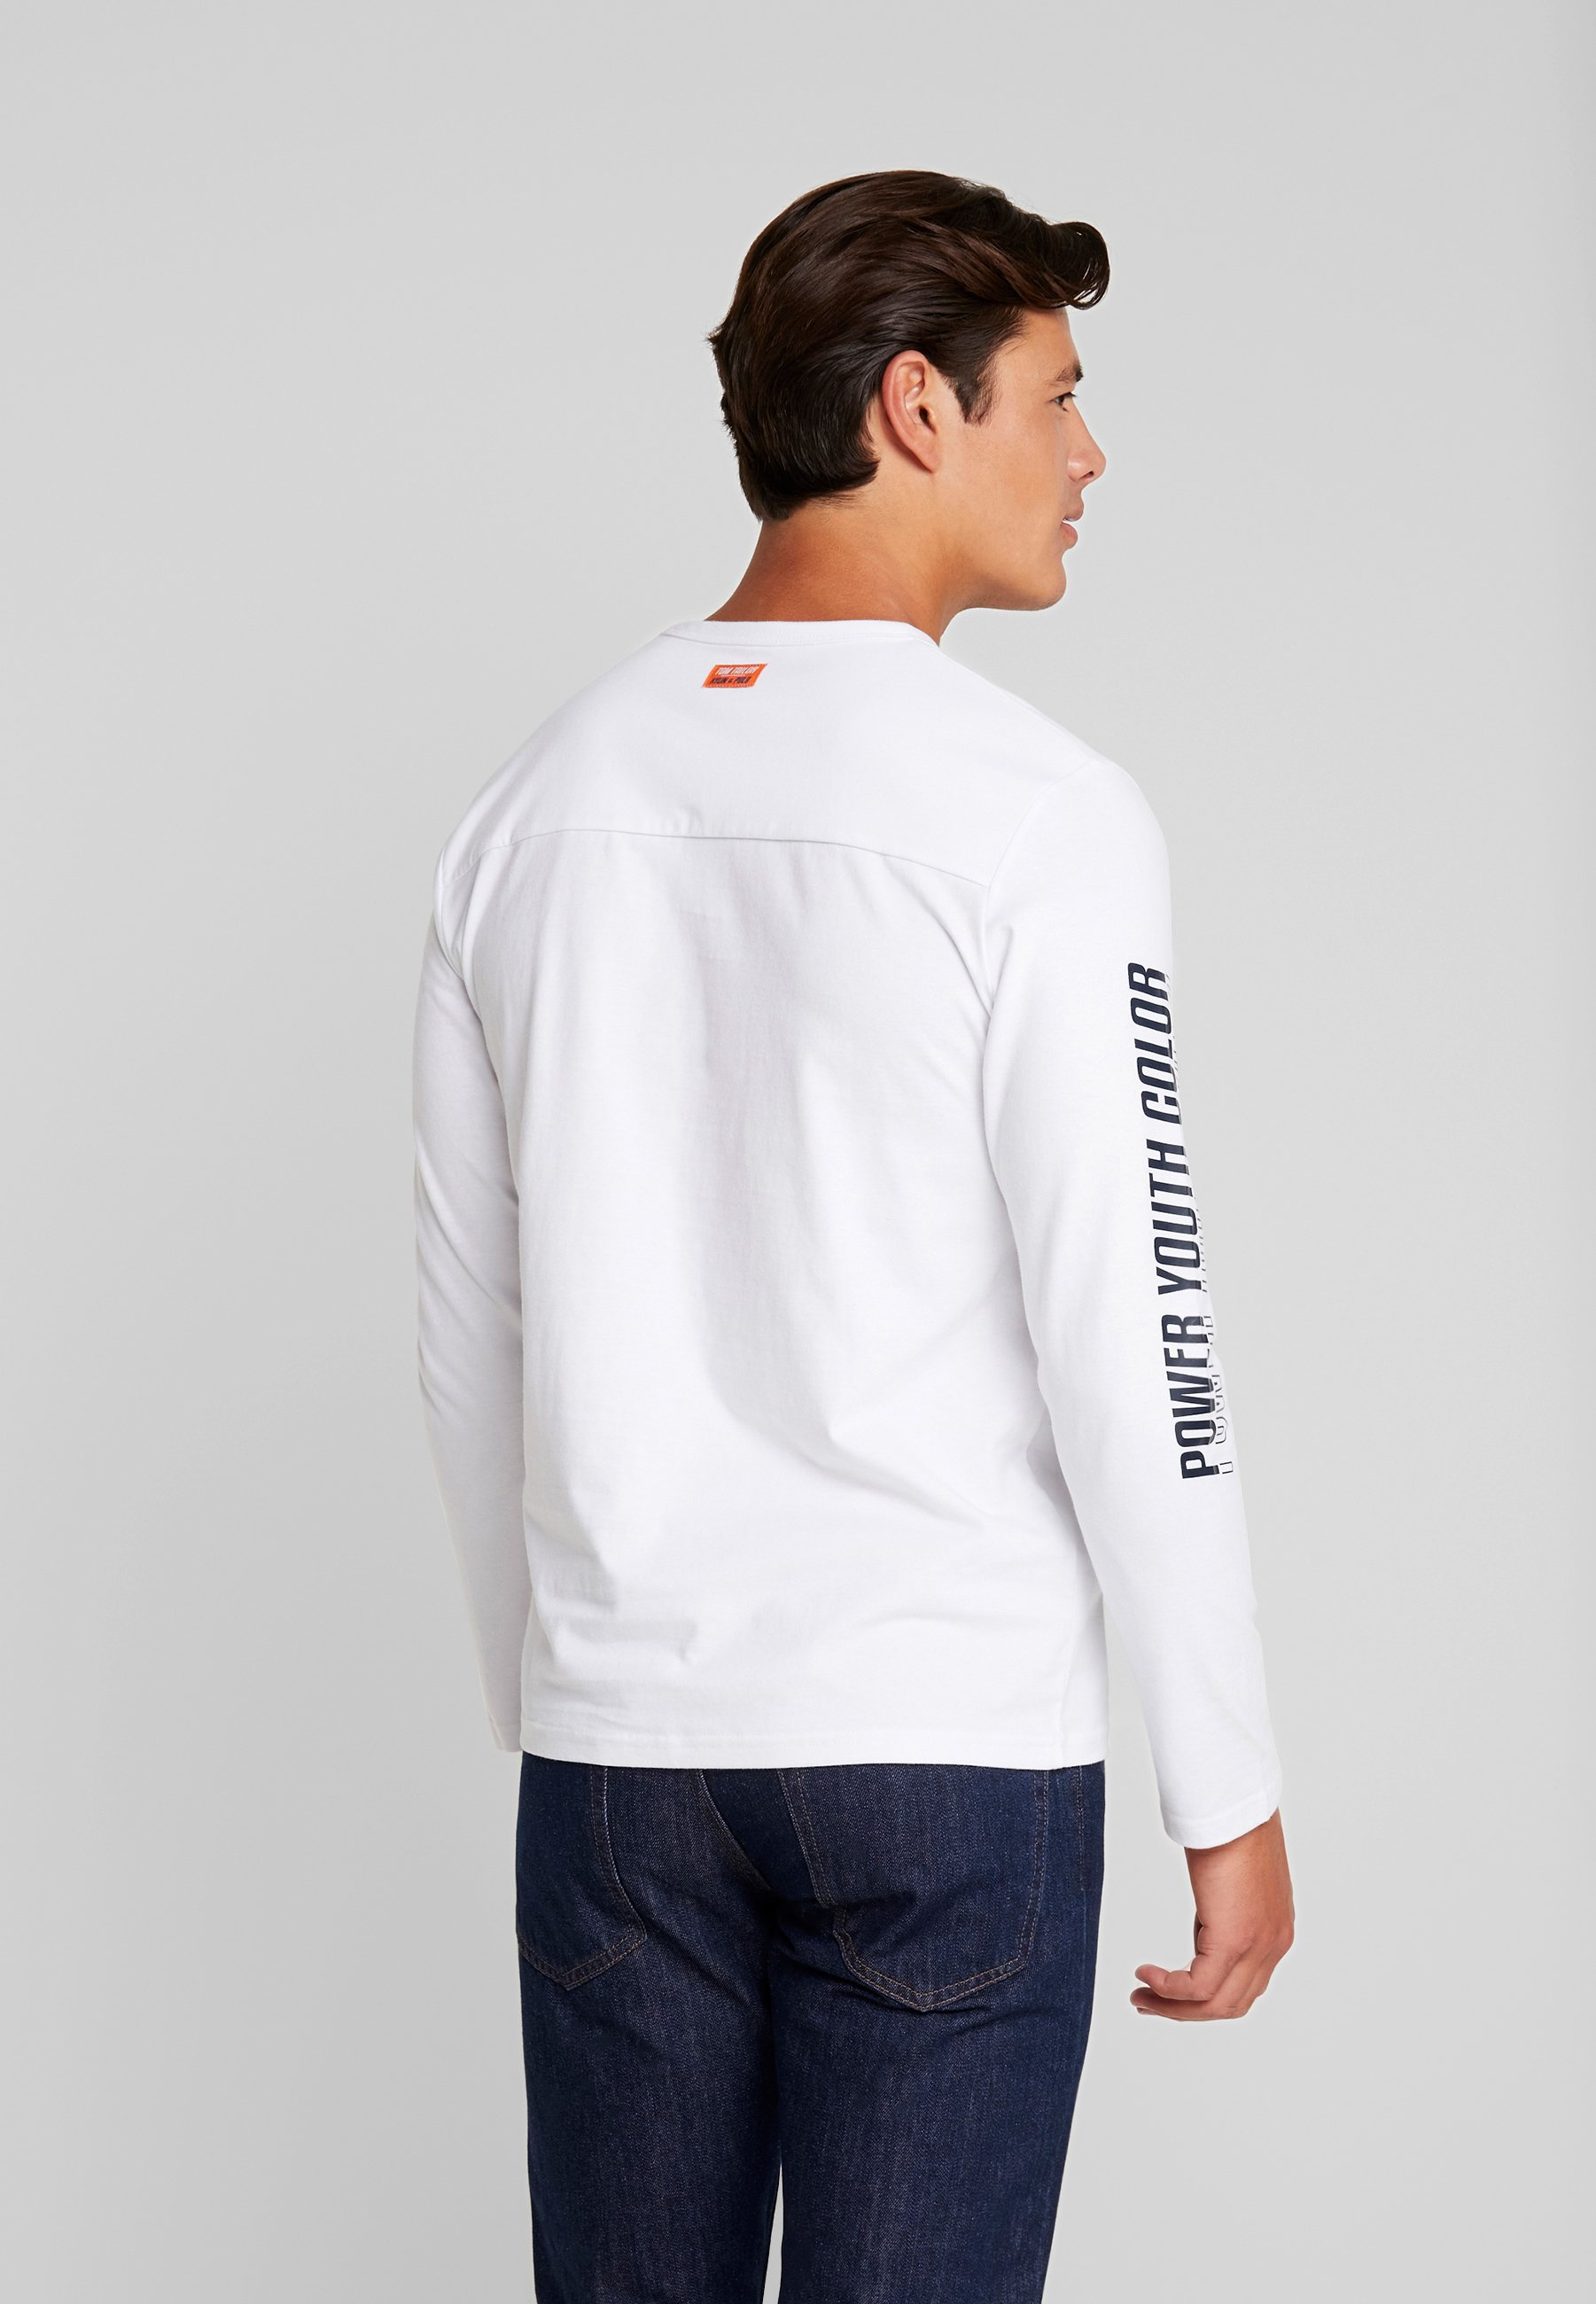 Tom shirt À Tailor Manches Longues LongsleeveT White 08mNnw